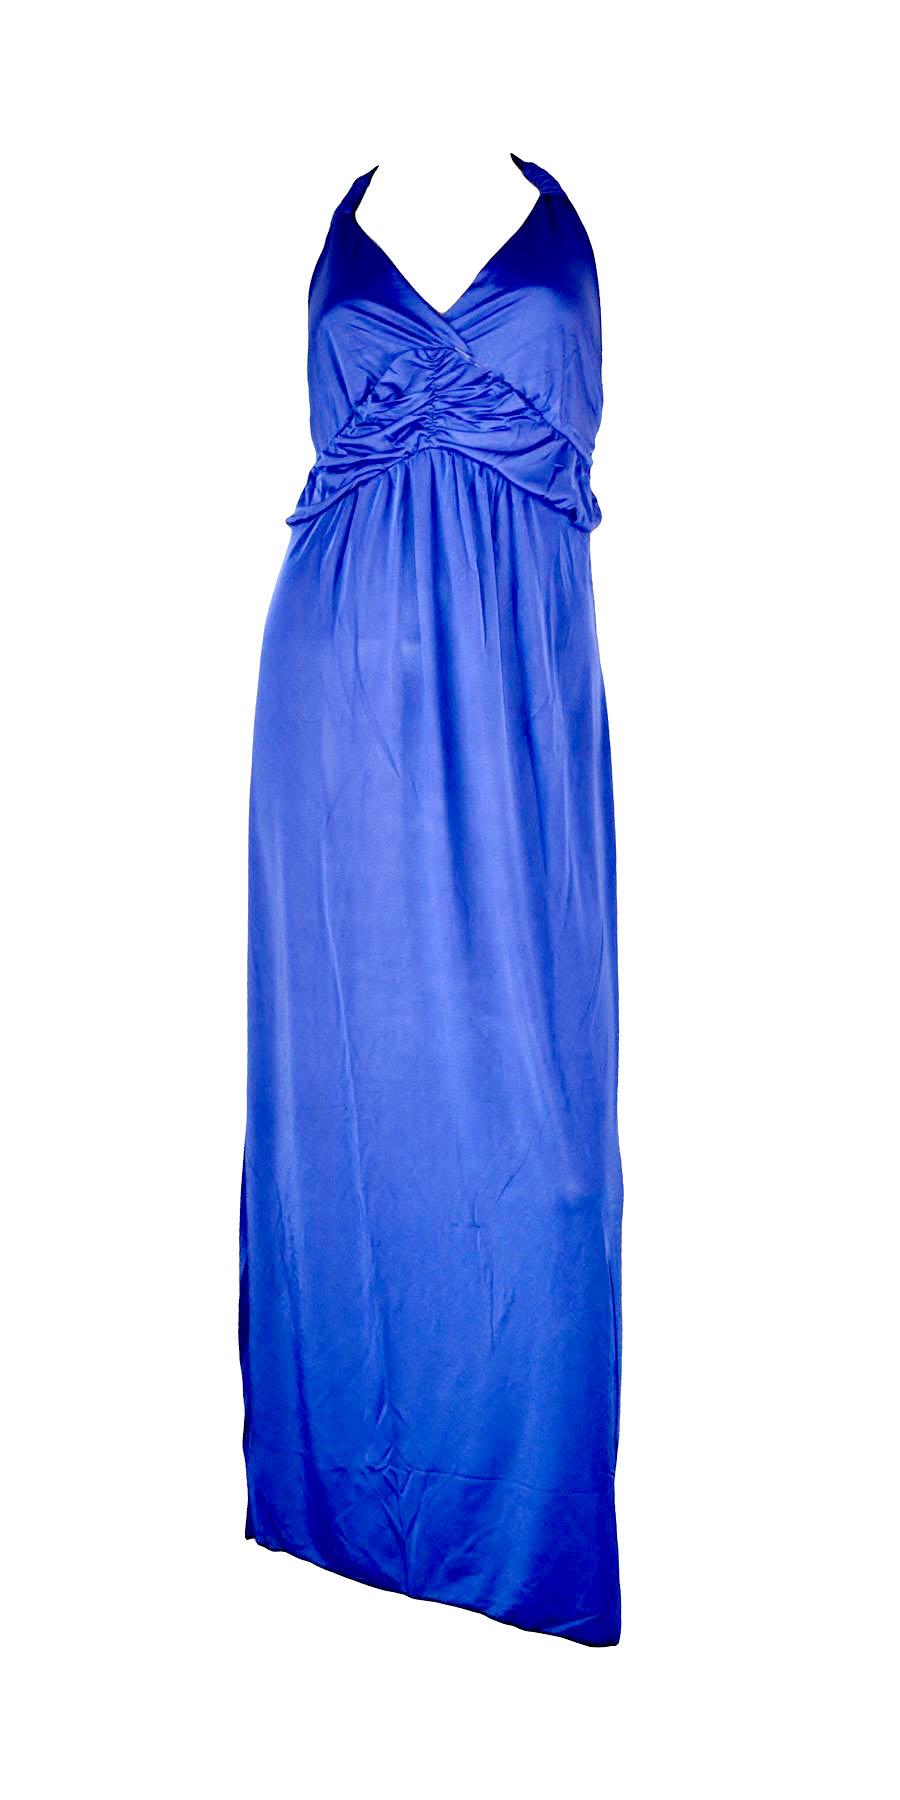 Belle Donne- Womenâx20AC;TMs Maxi Dress Sleeveless Halter Top Solid Colors Long Dress - Blue